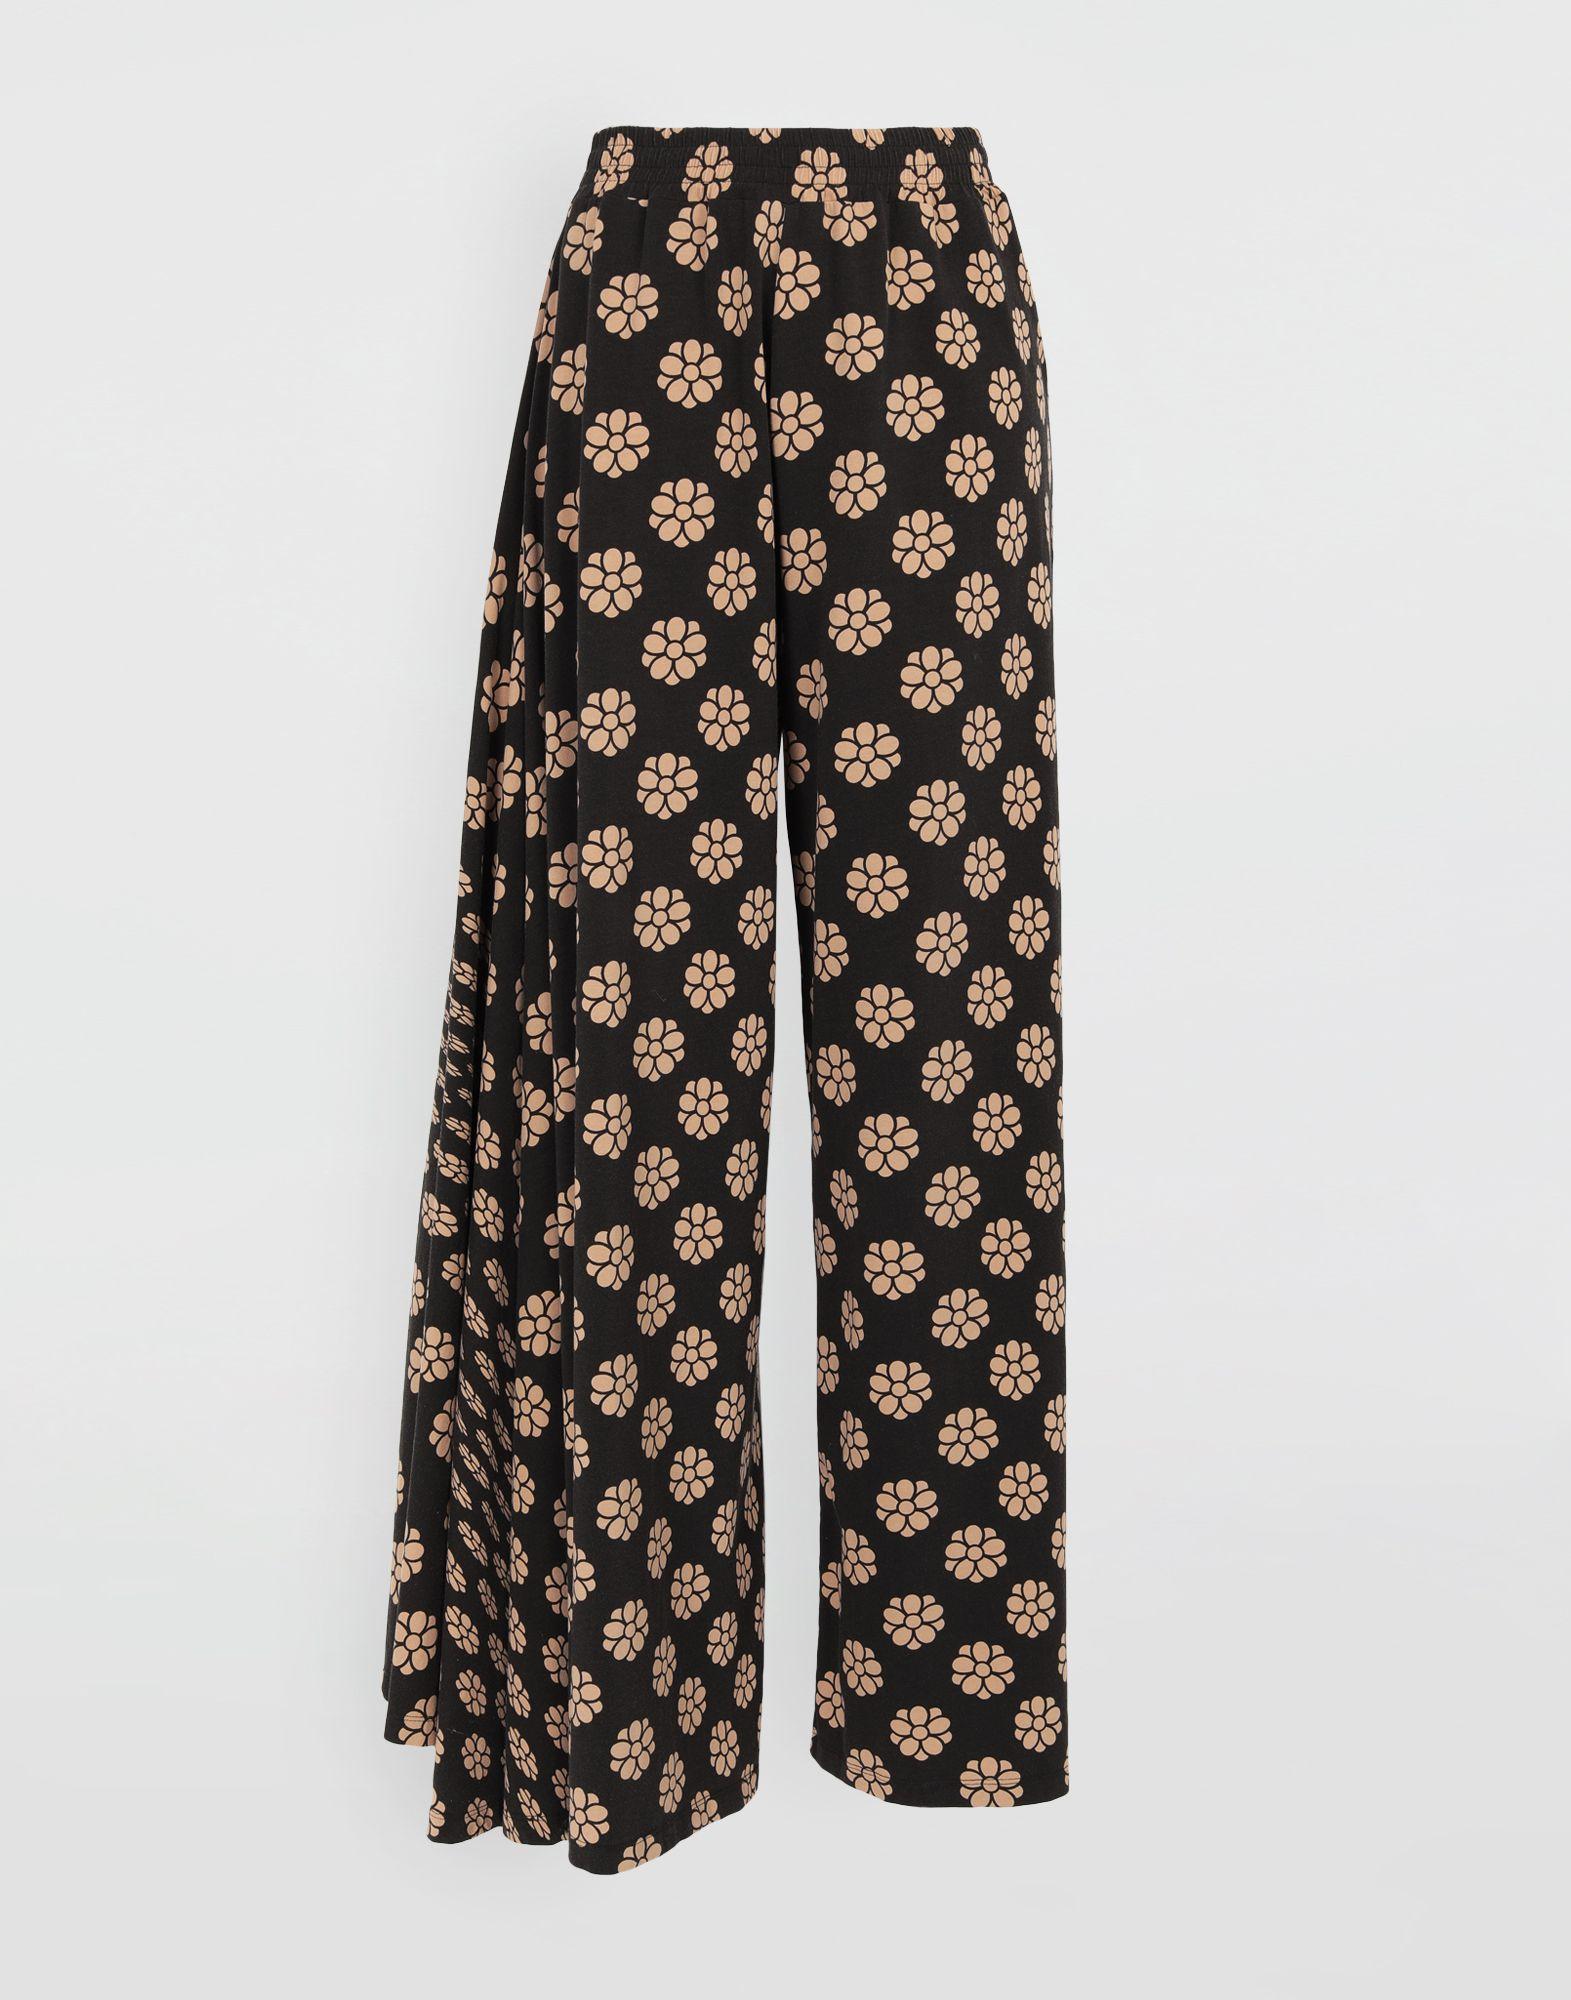 MM6 MAISON MARGIELA Polka dot flower-print pants Trousers Woman f